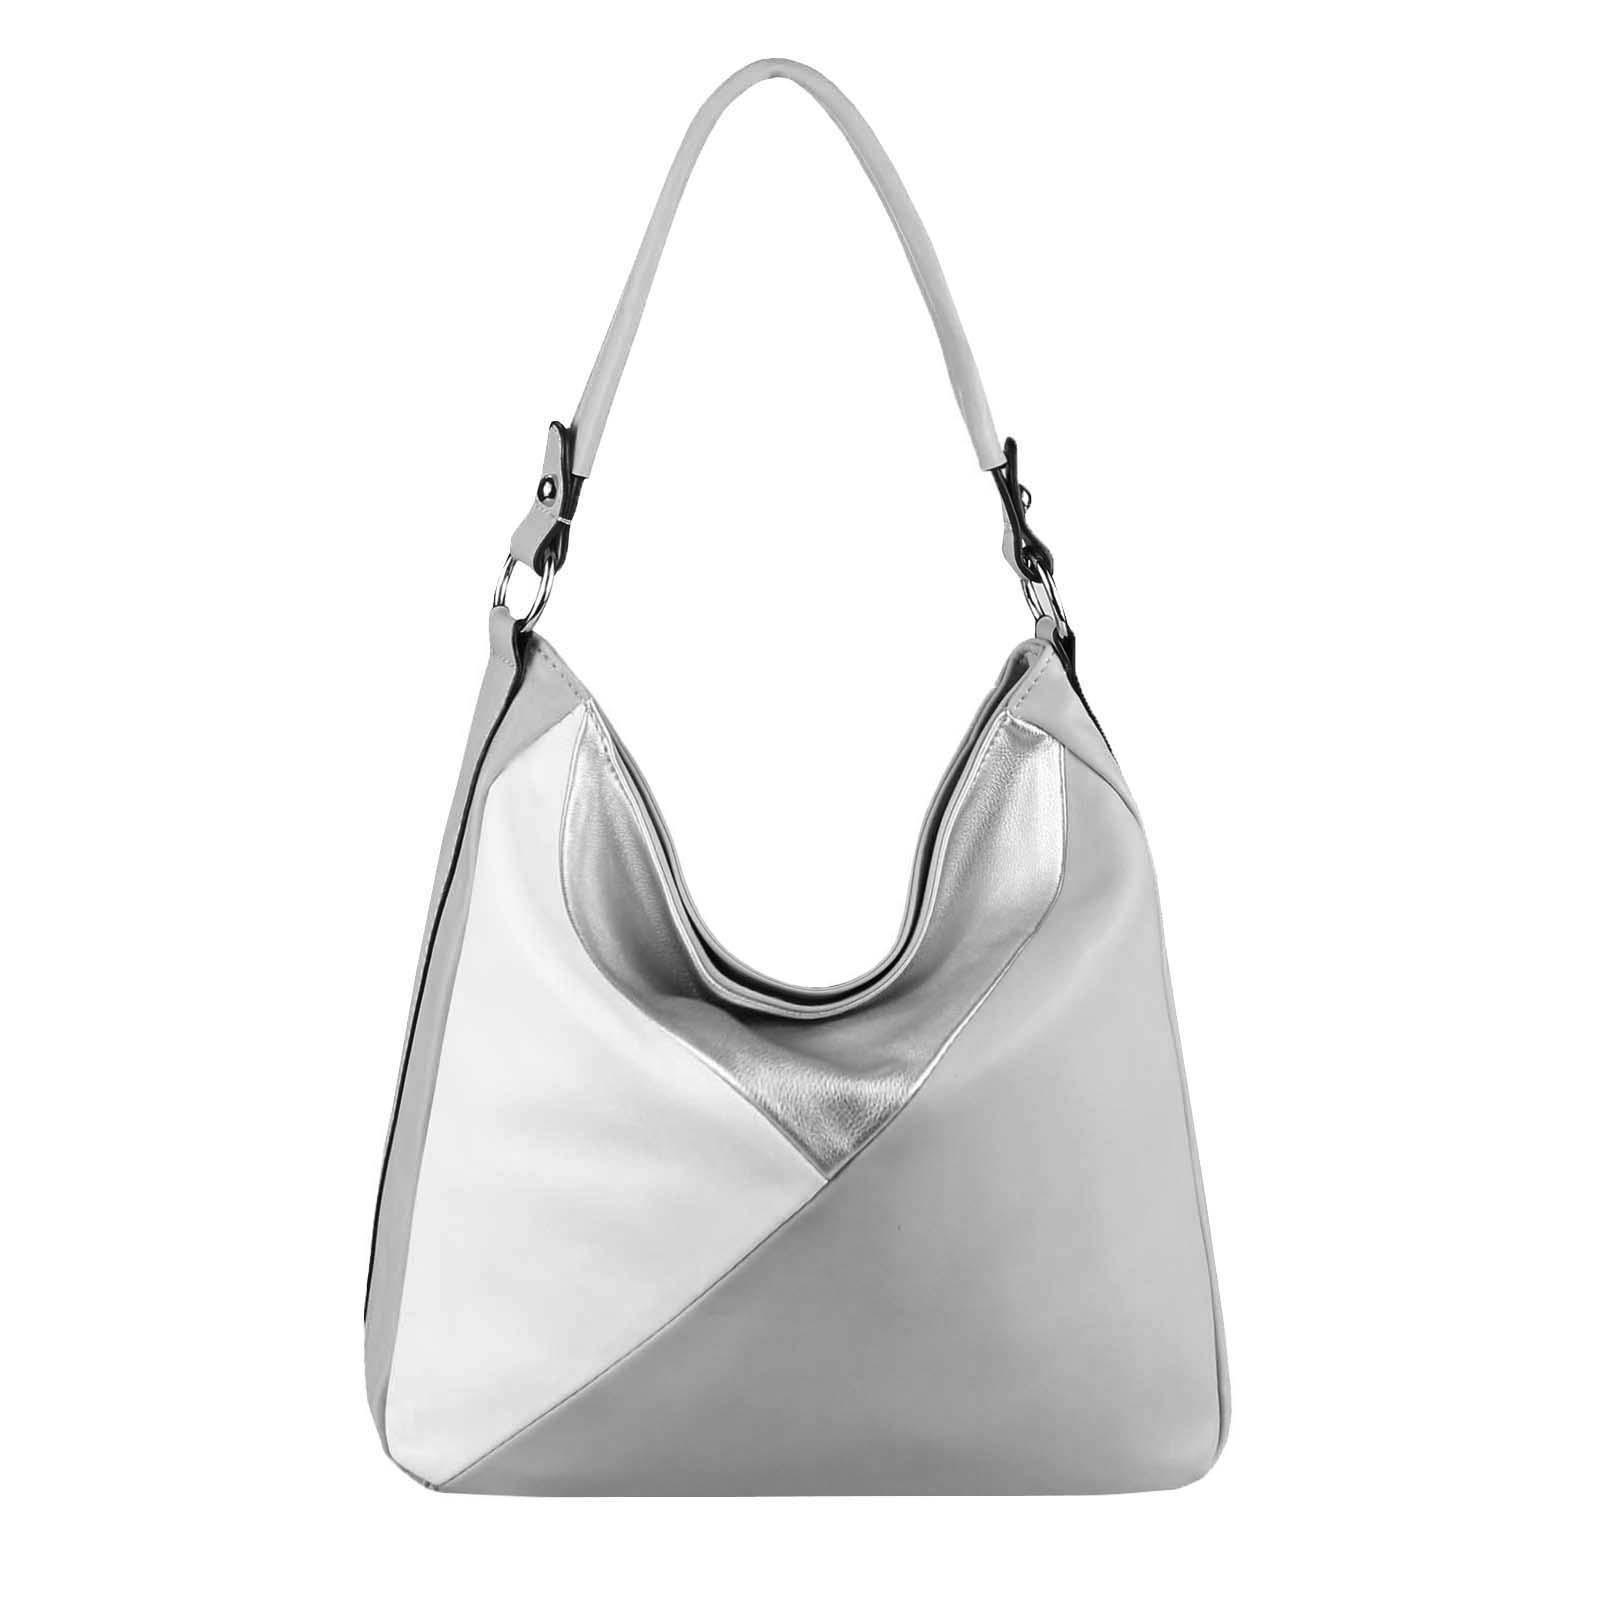 DAMEN TASCHE XXL Metallic Shopper Hobo Bag Umhängetasche